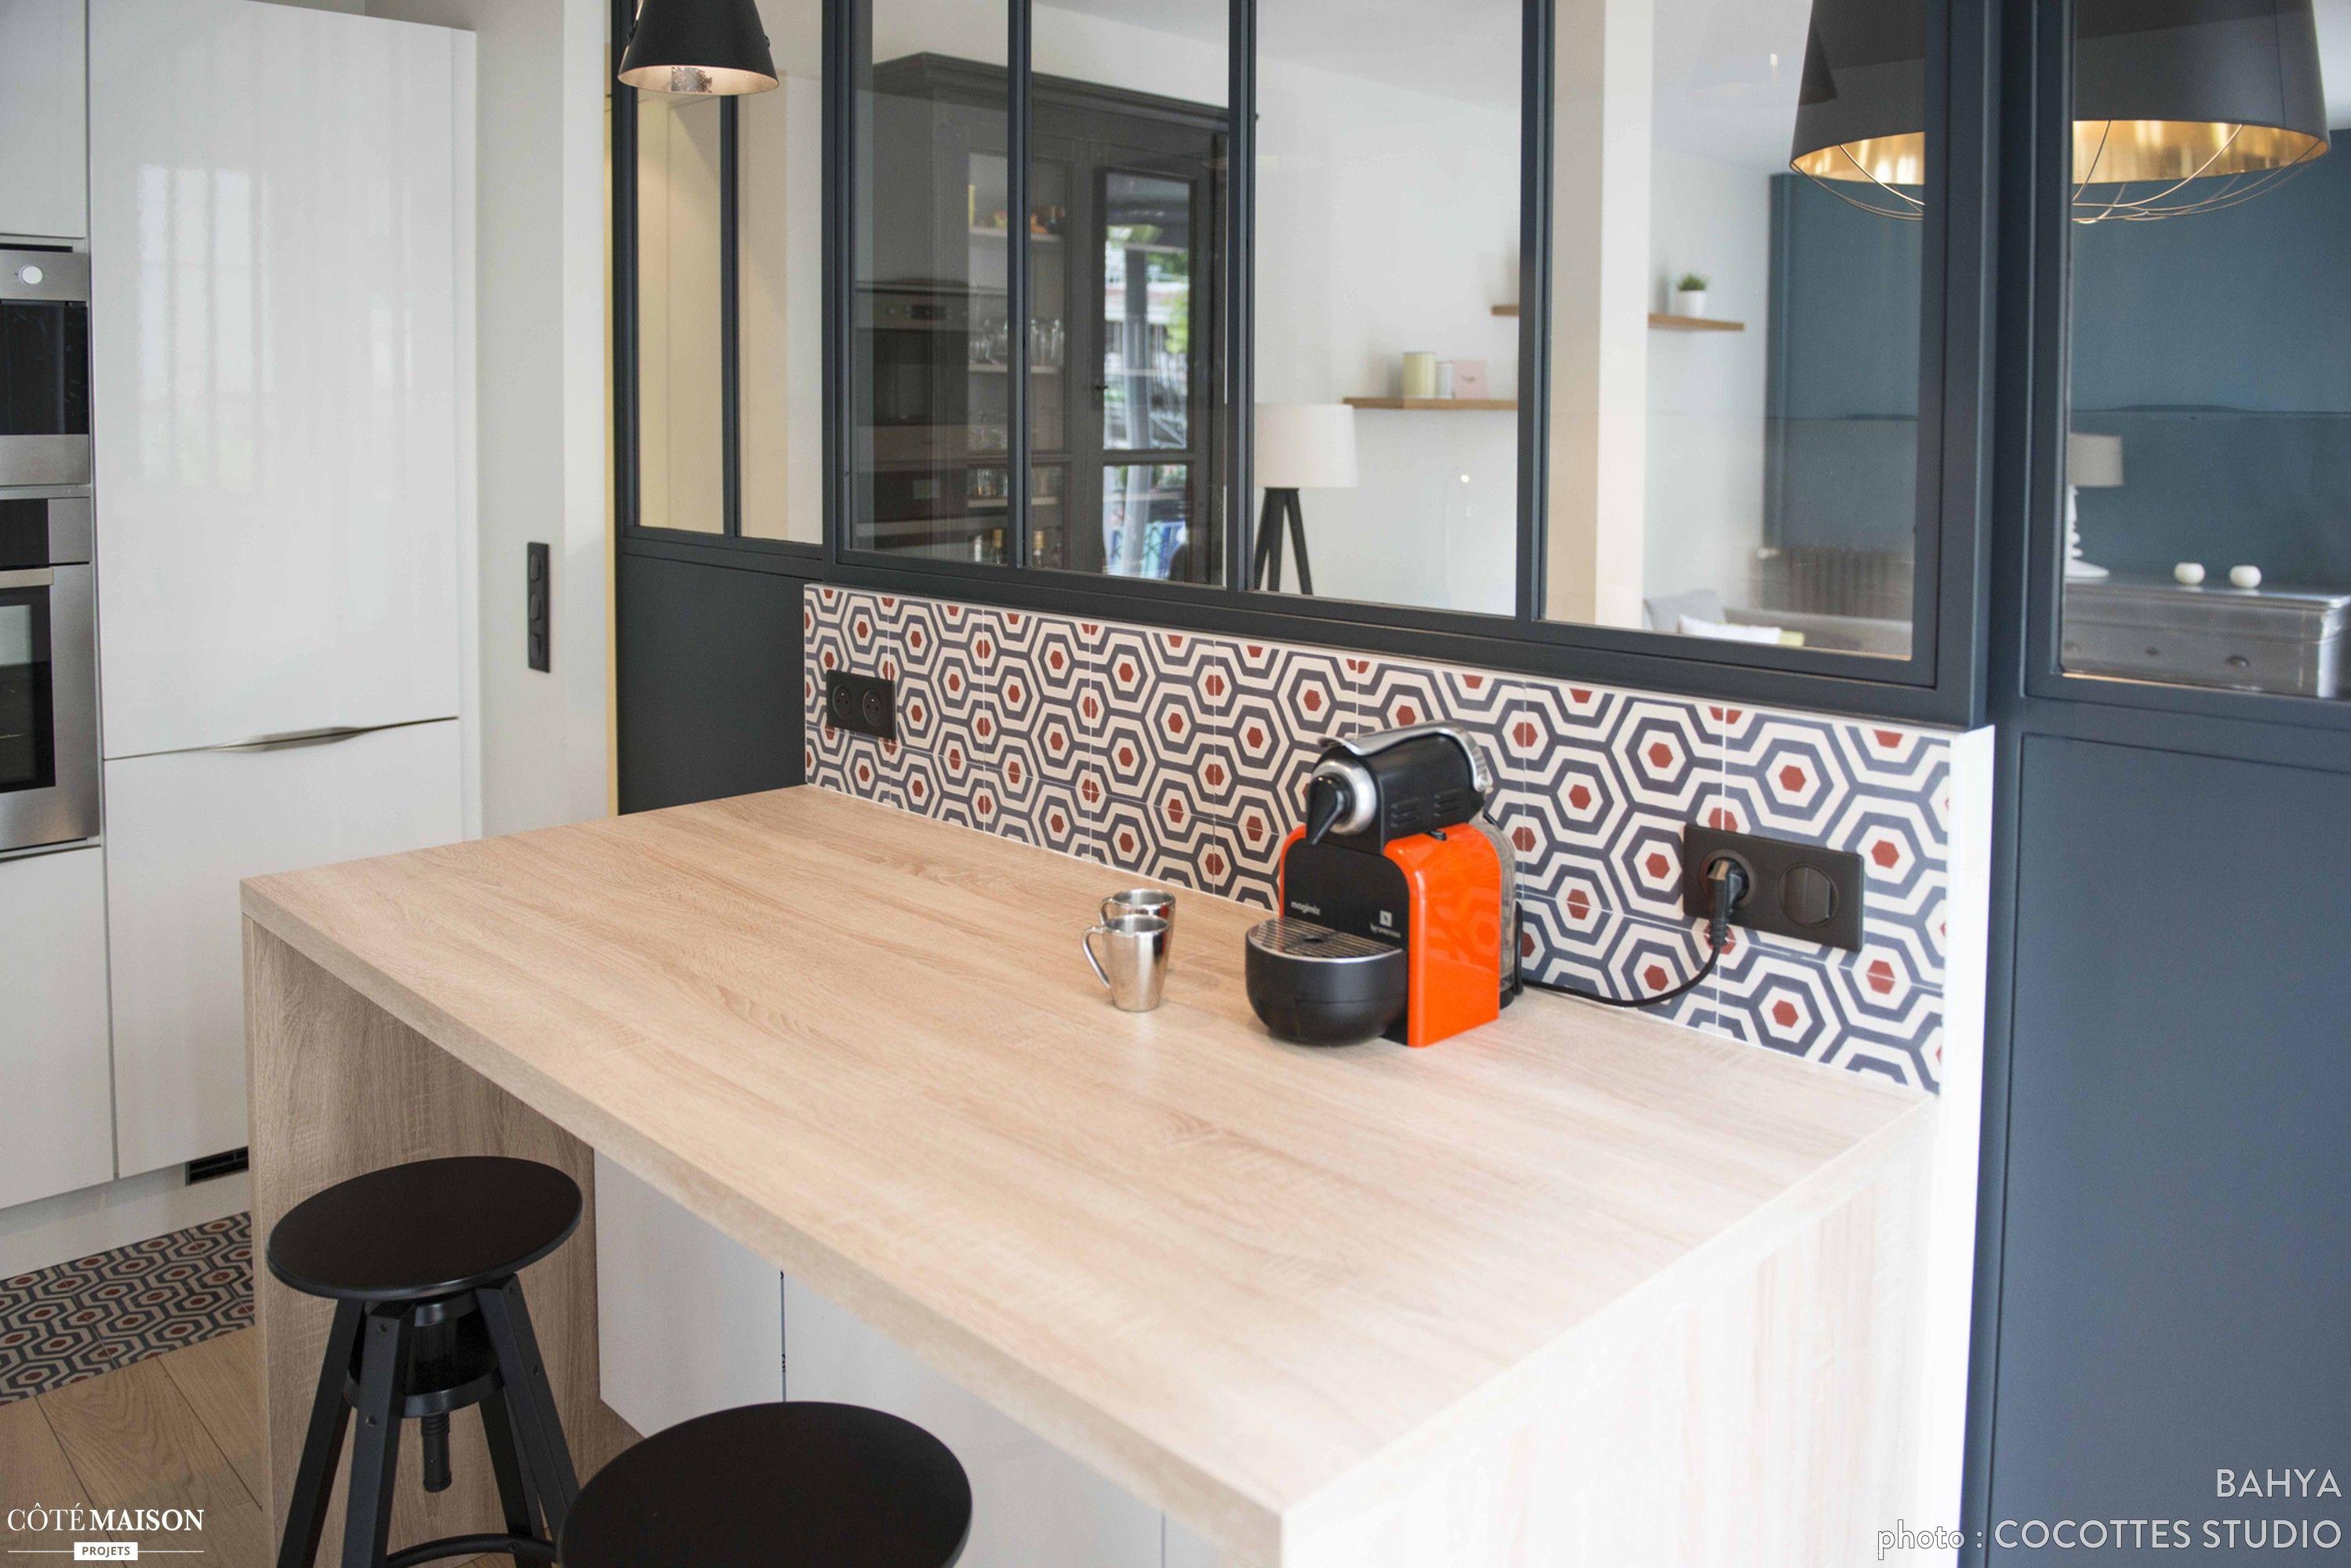 r alisation cocottes studio sol et cr dence en carreaux de ciment bahya motif lunatic. Black Bedroom Furniture Sets. Home Design Ideas